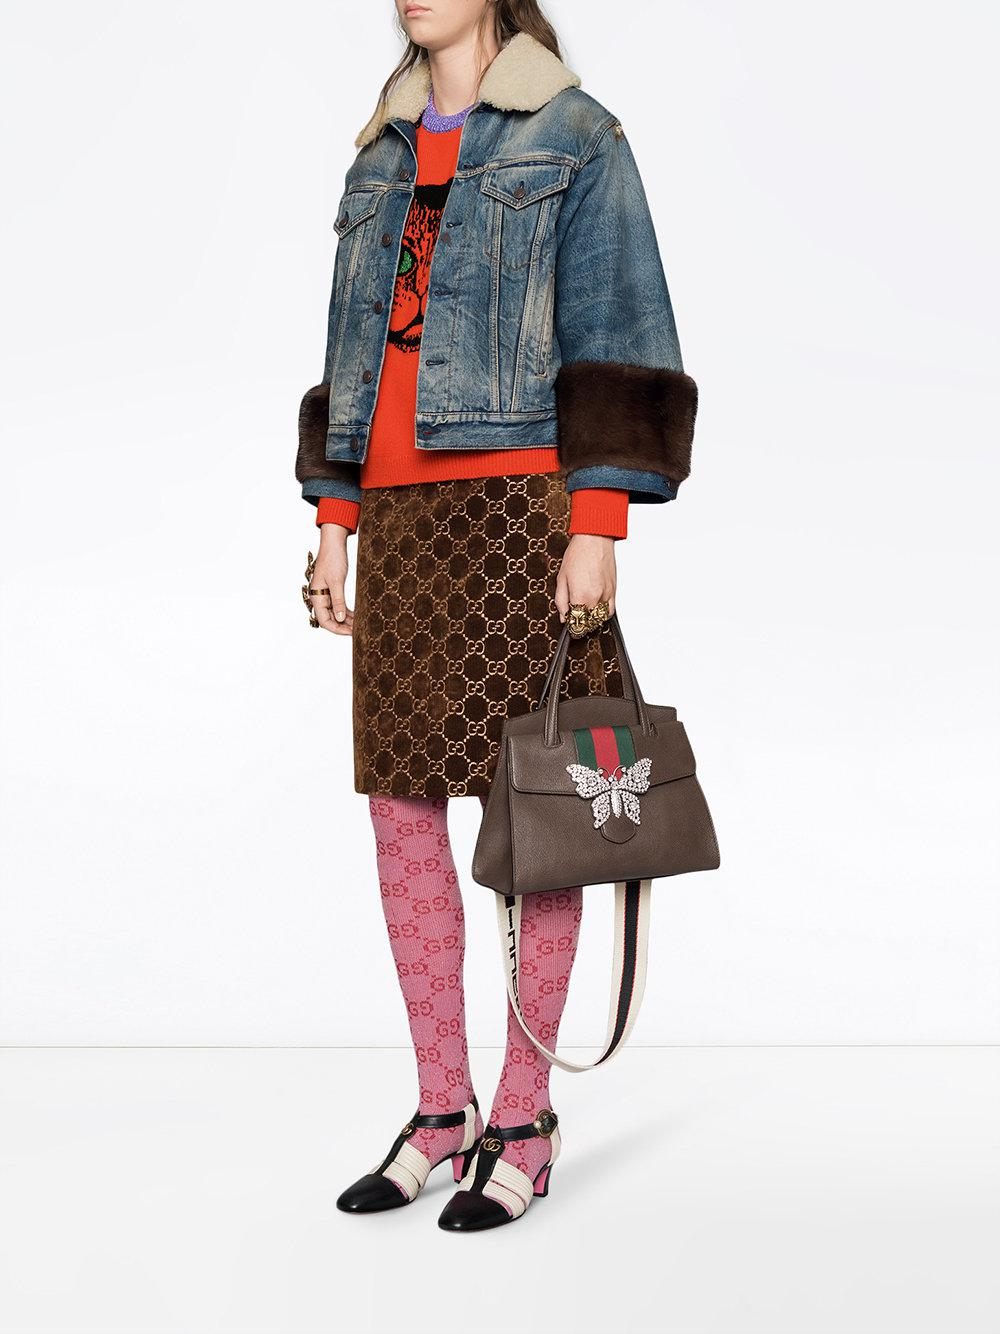 ee1024bb0fbc Gucci Totem Medium Top Handle Bag in Brown - Save 30% - Lyst